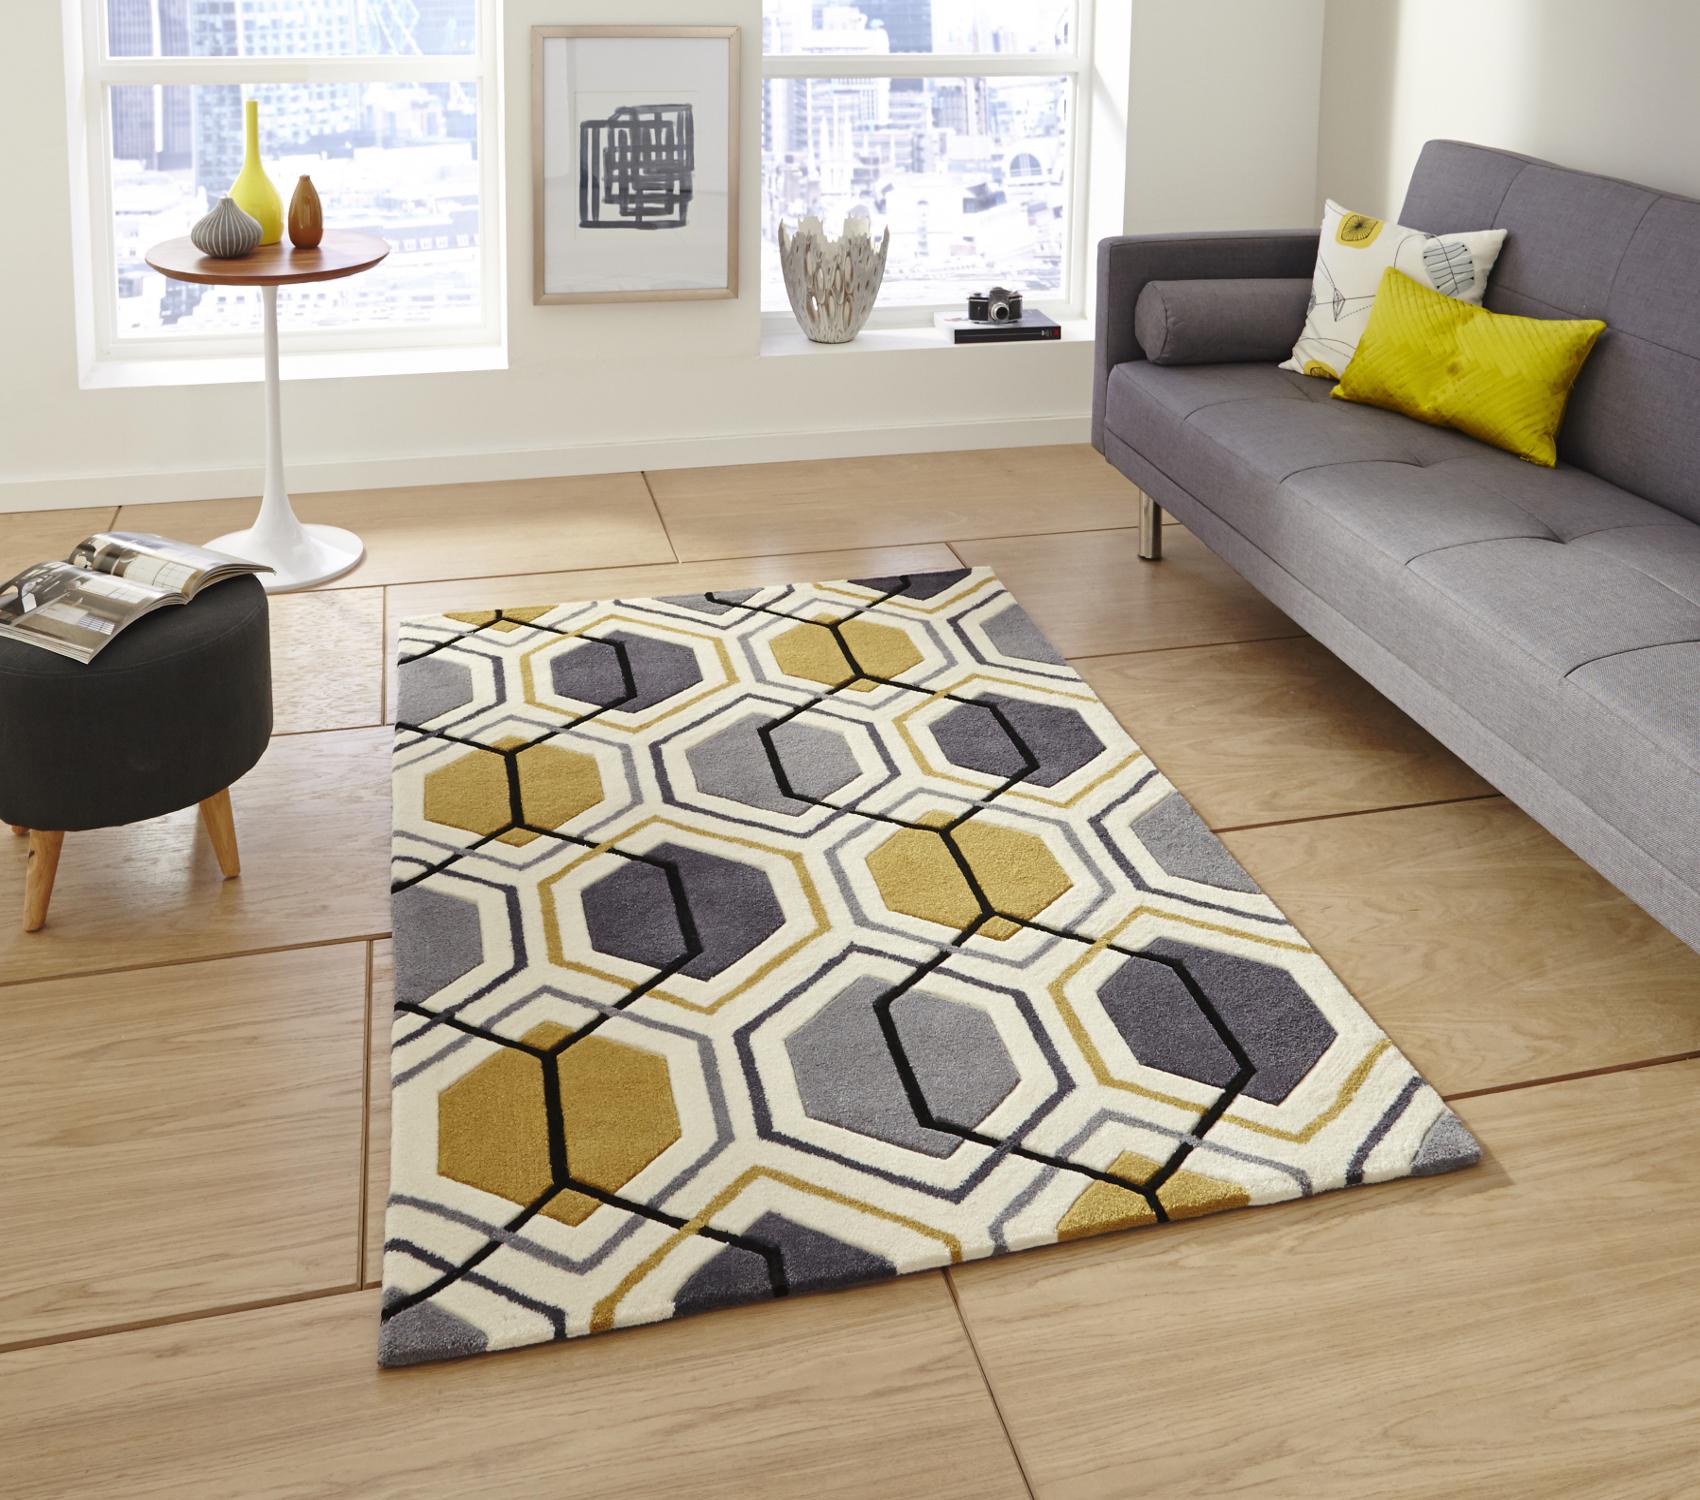 Geometric Hexagon Design Rug Hong Kong Hand Tufted 100% Acrylic Mat ...